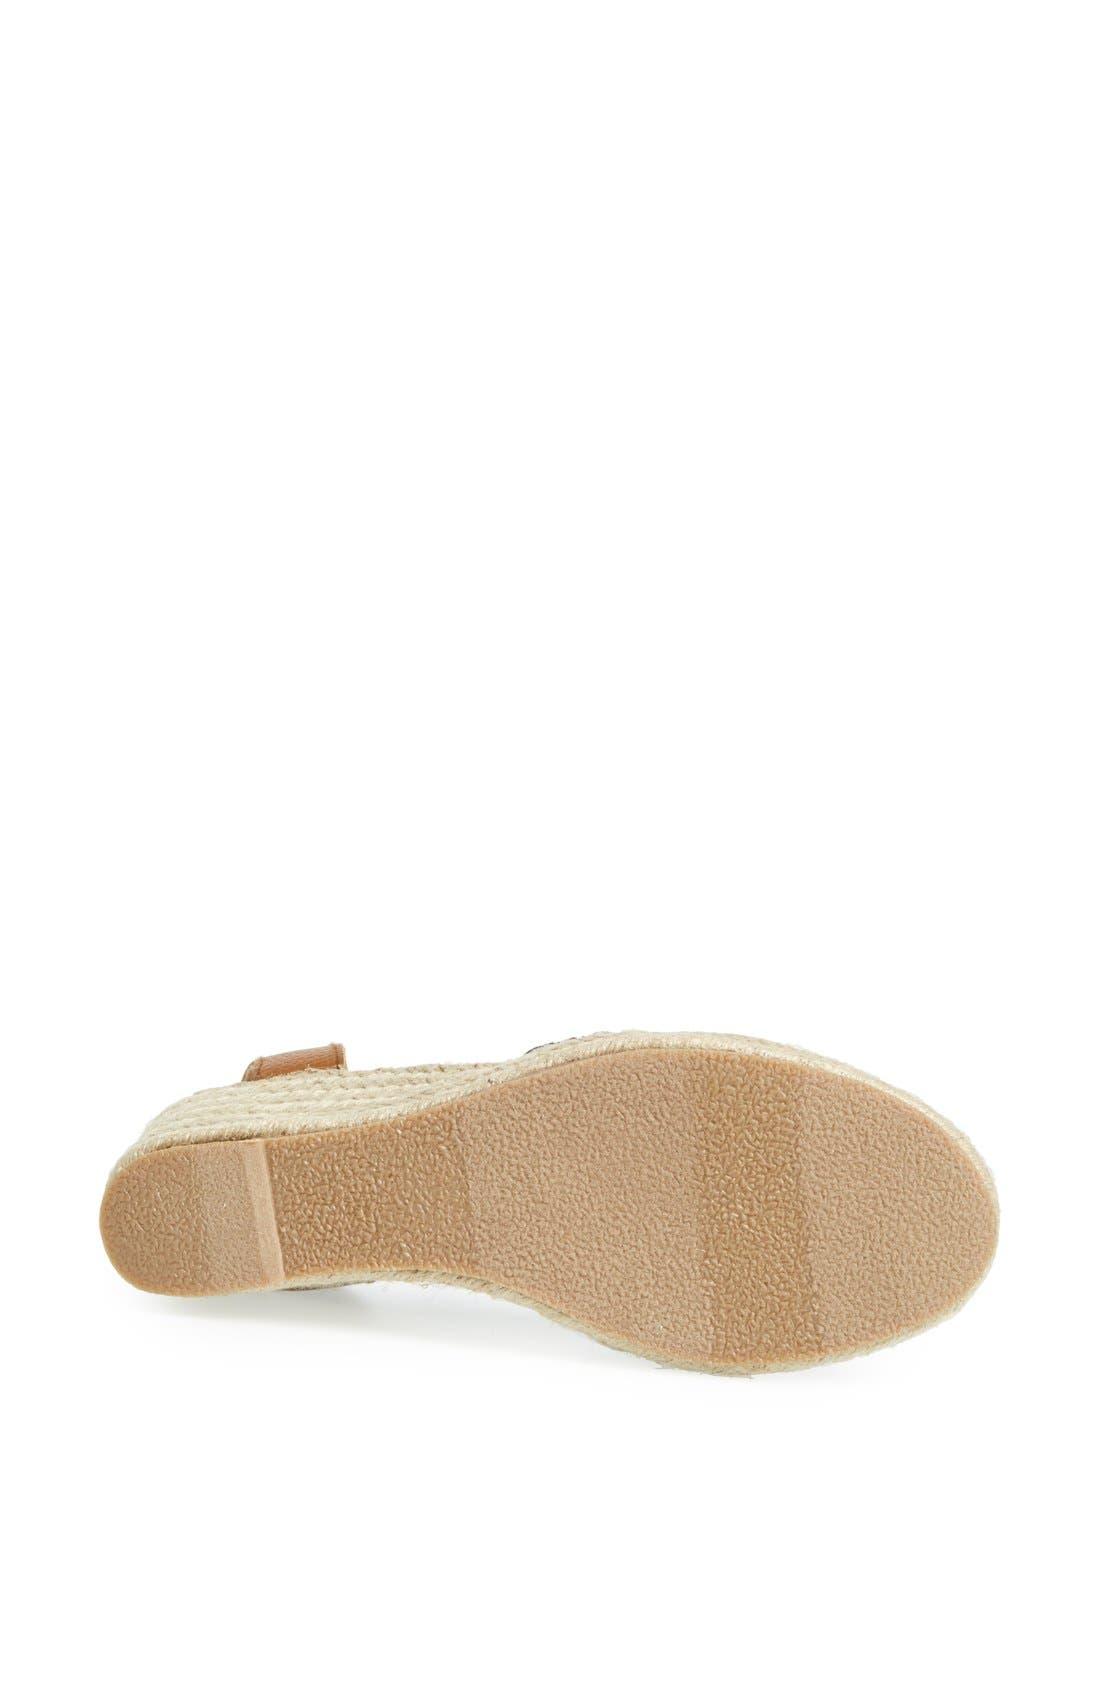 Alternate Image 4  - Soludos 'Handshake' Espadrille Wedge Sandal